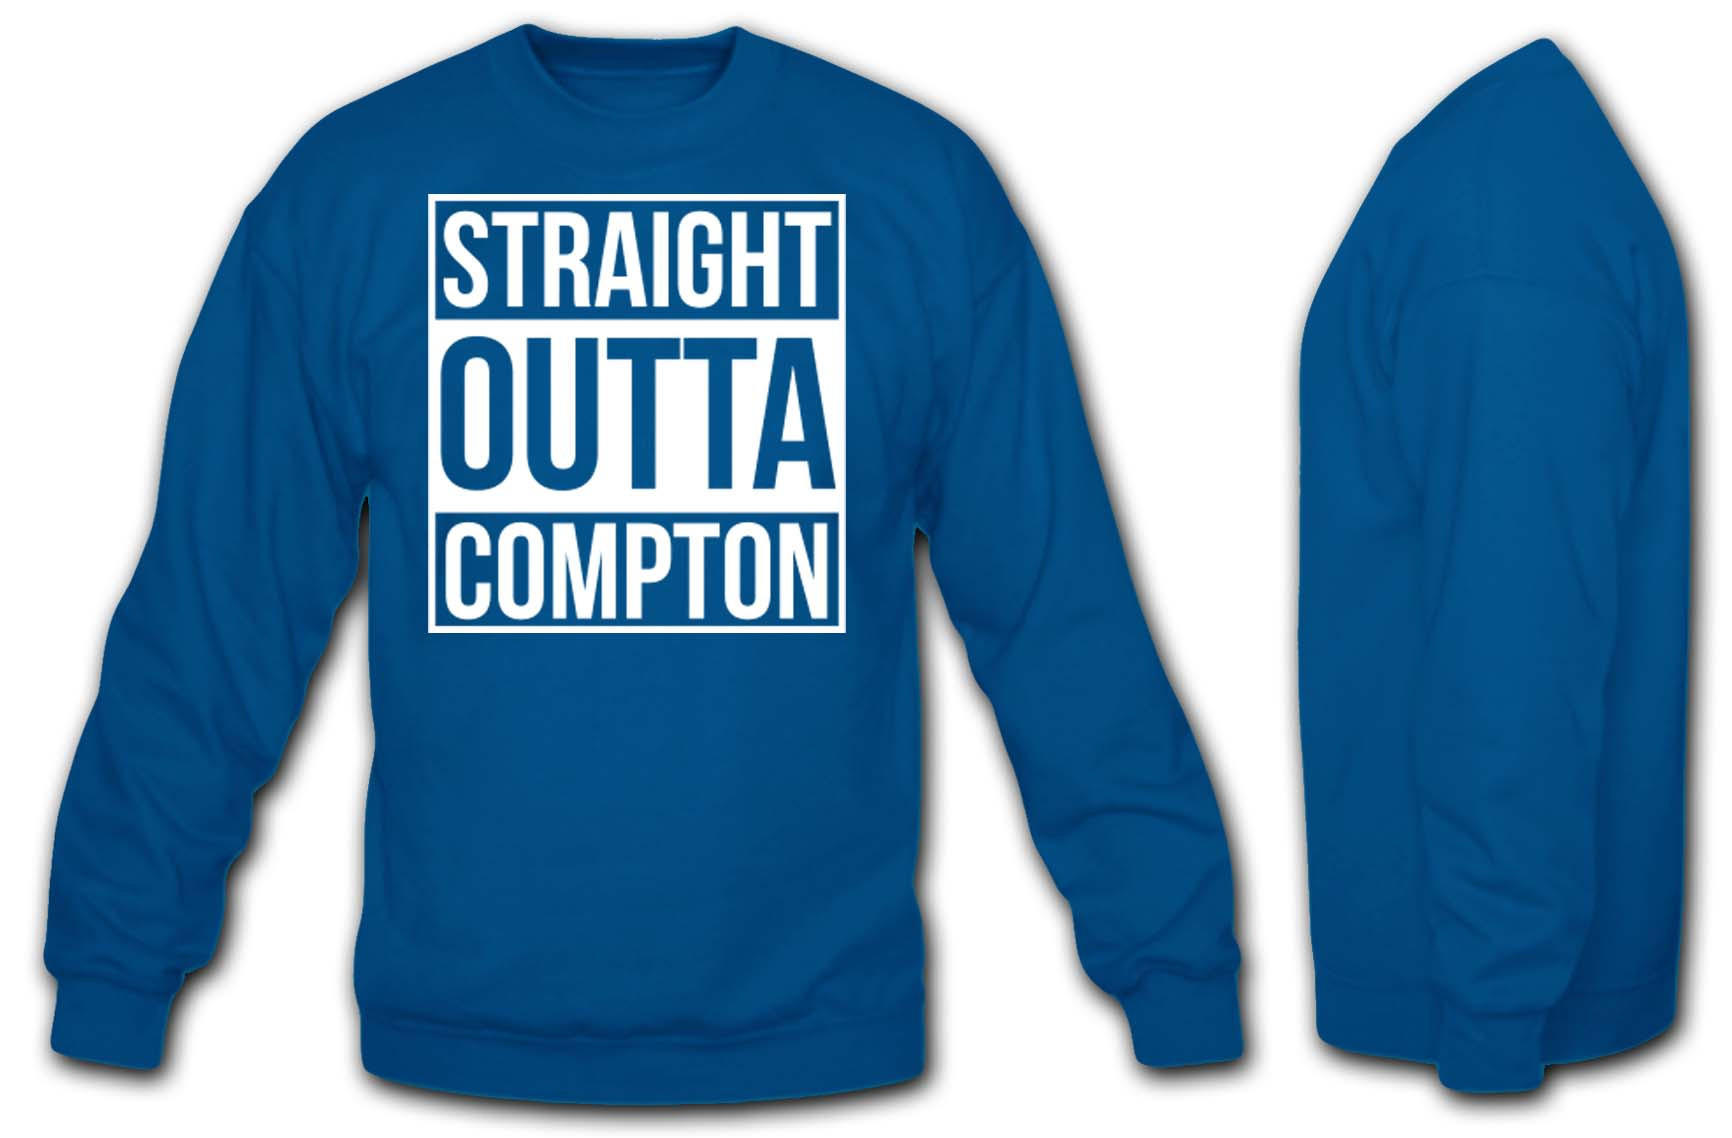 1732x1138 Straight Outta Compton Sweatshirt From Teee Shop Sweatshirt